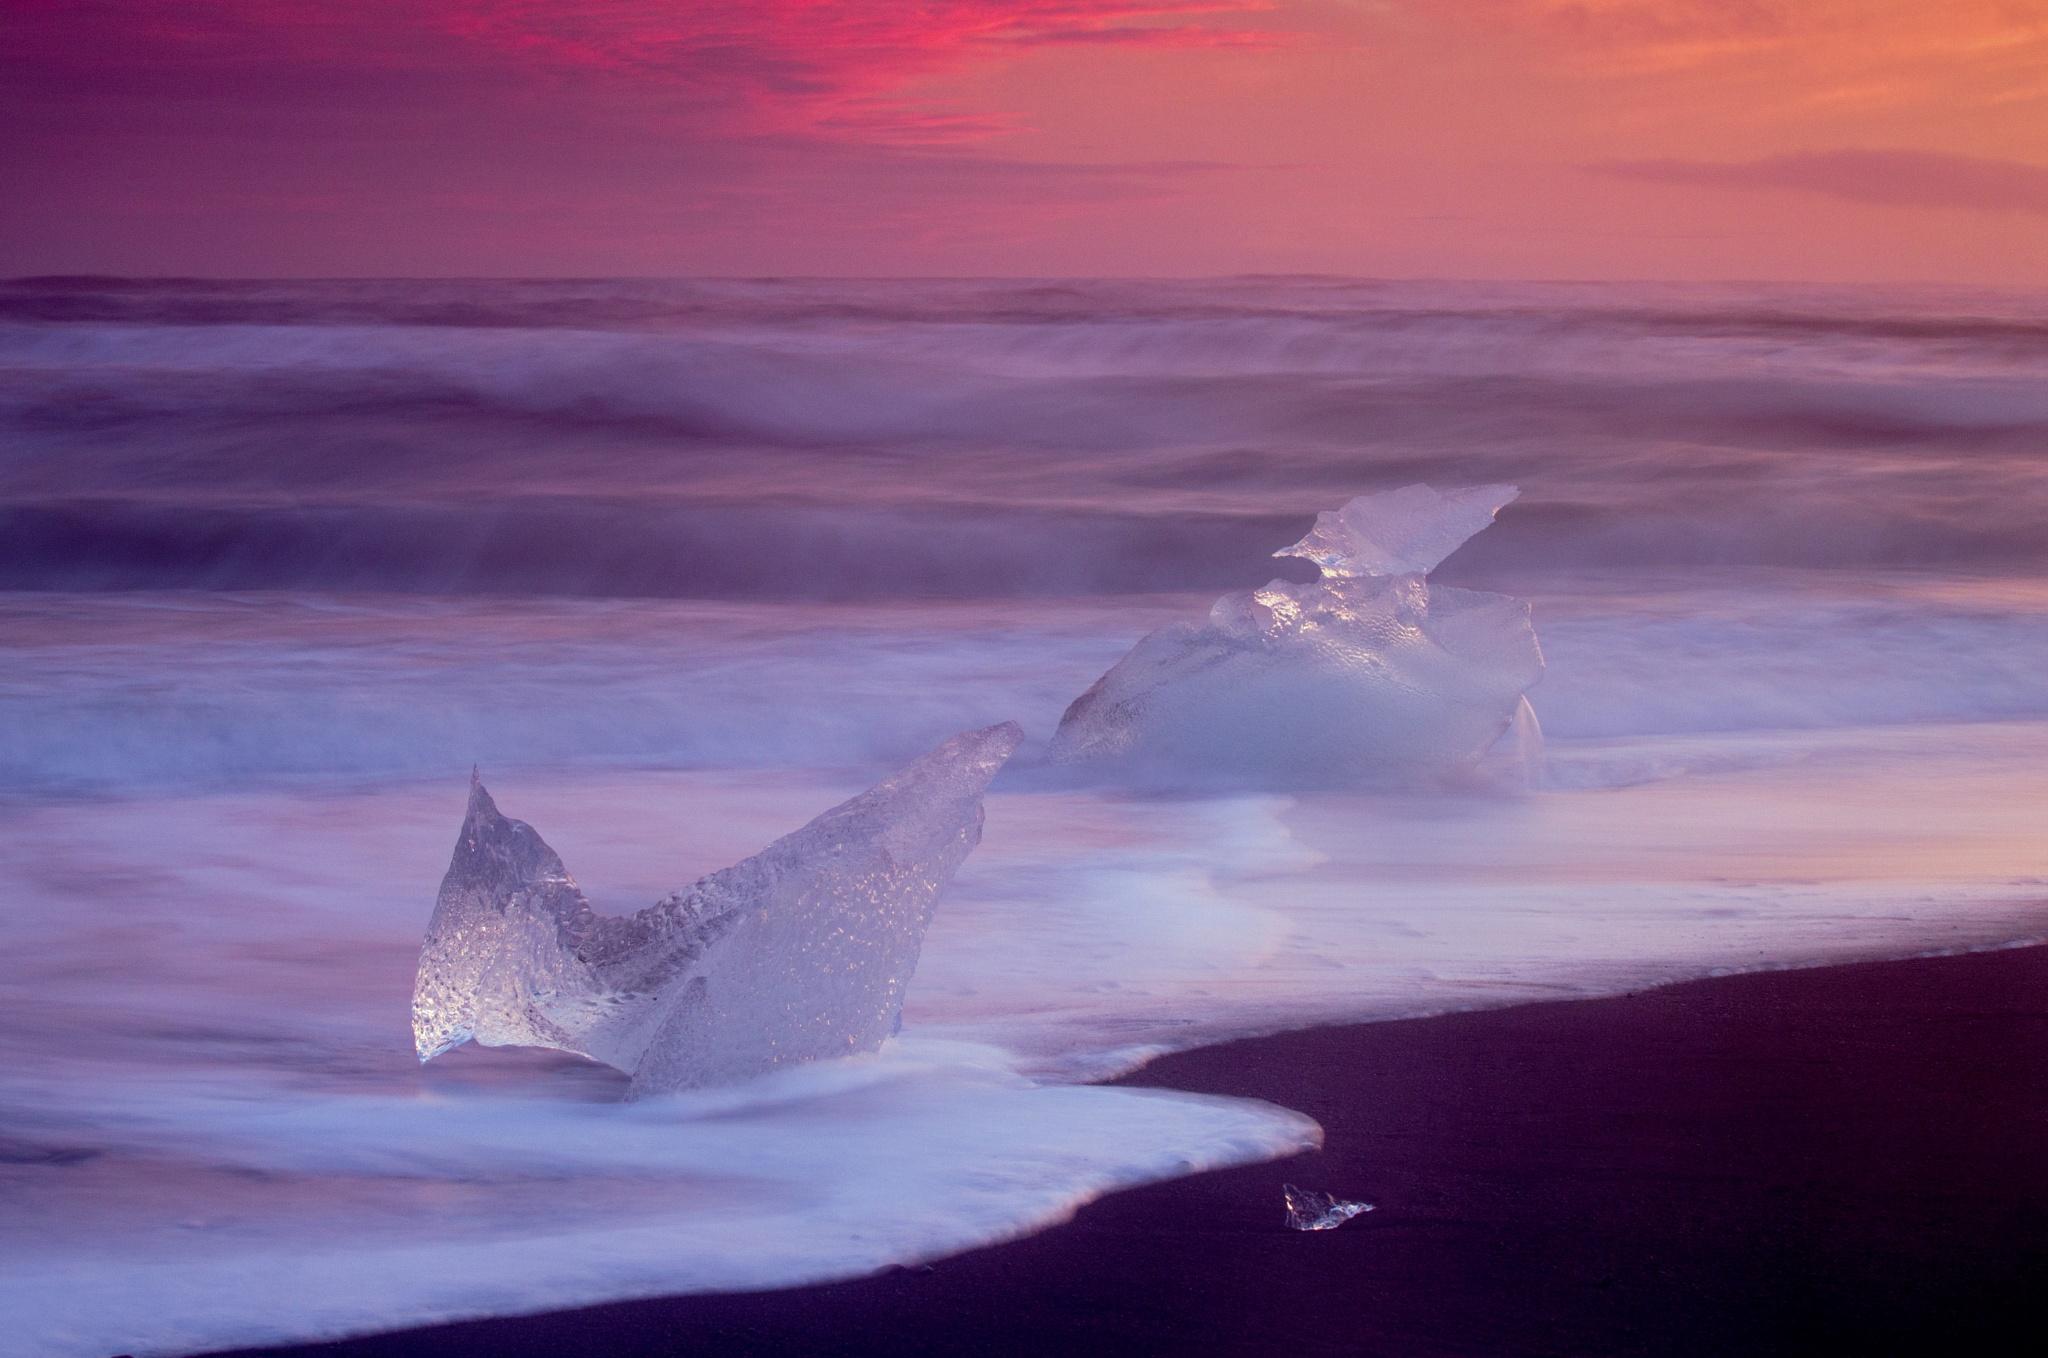 Sea ice by Gordon Dryden